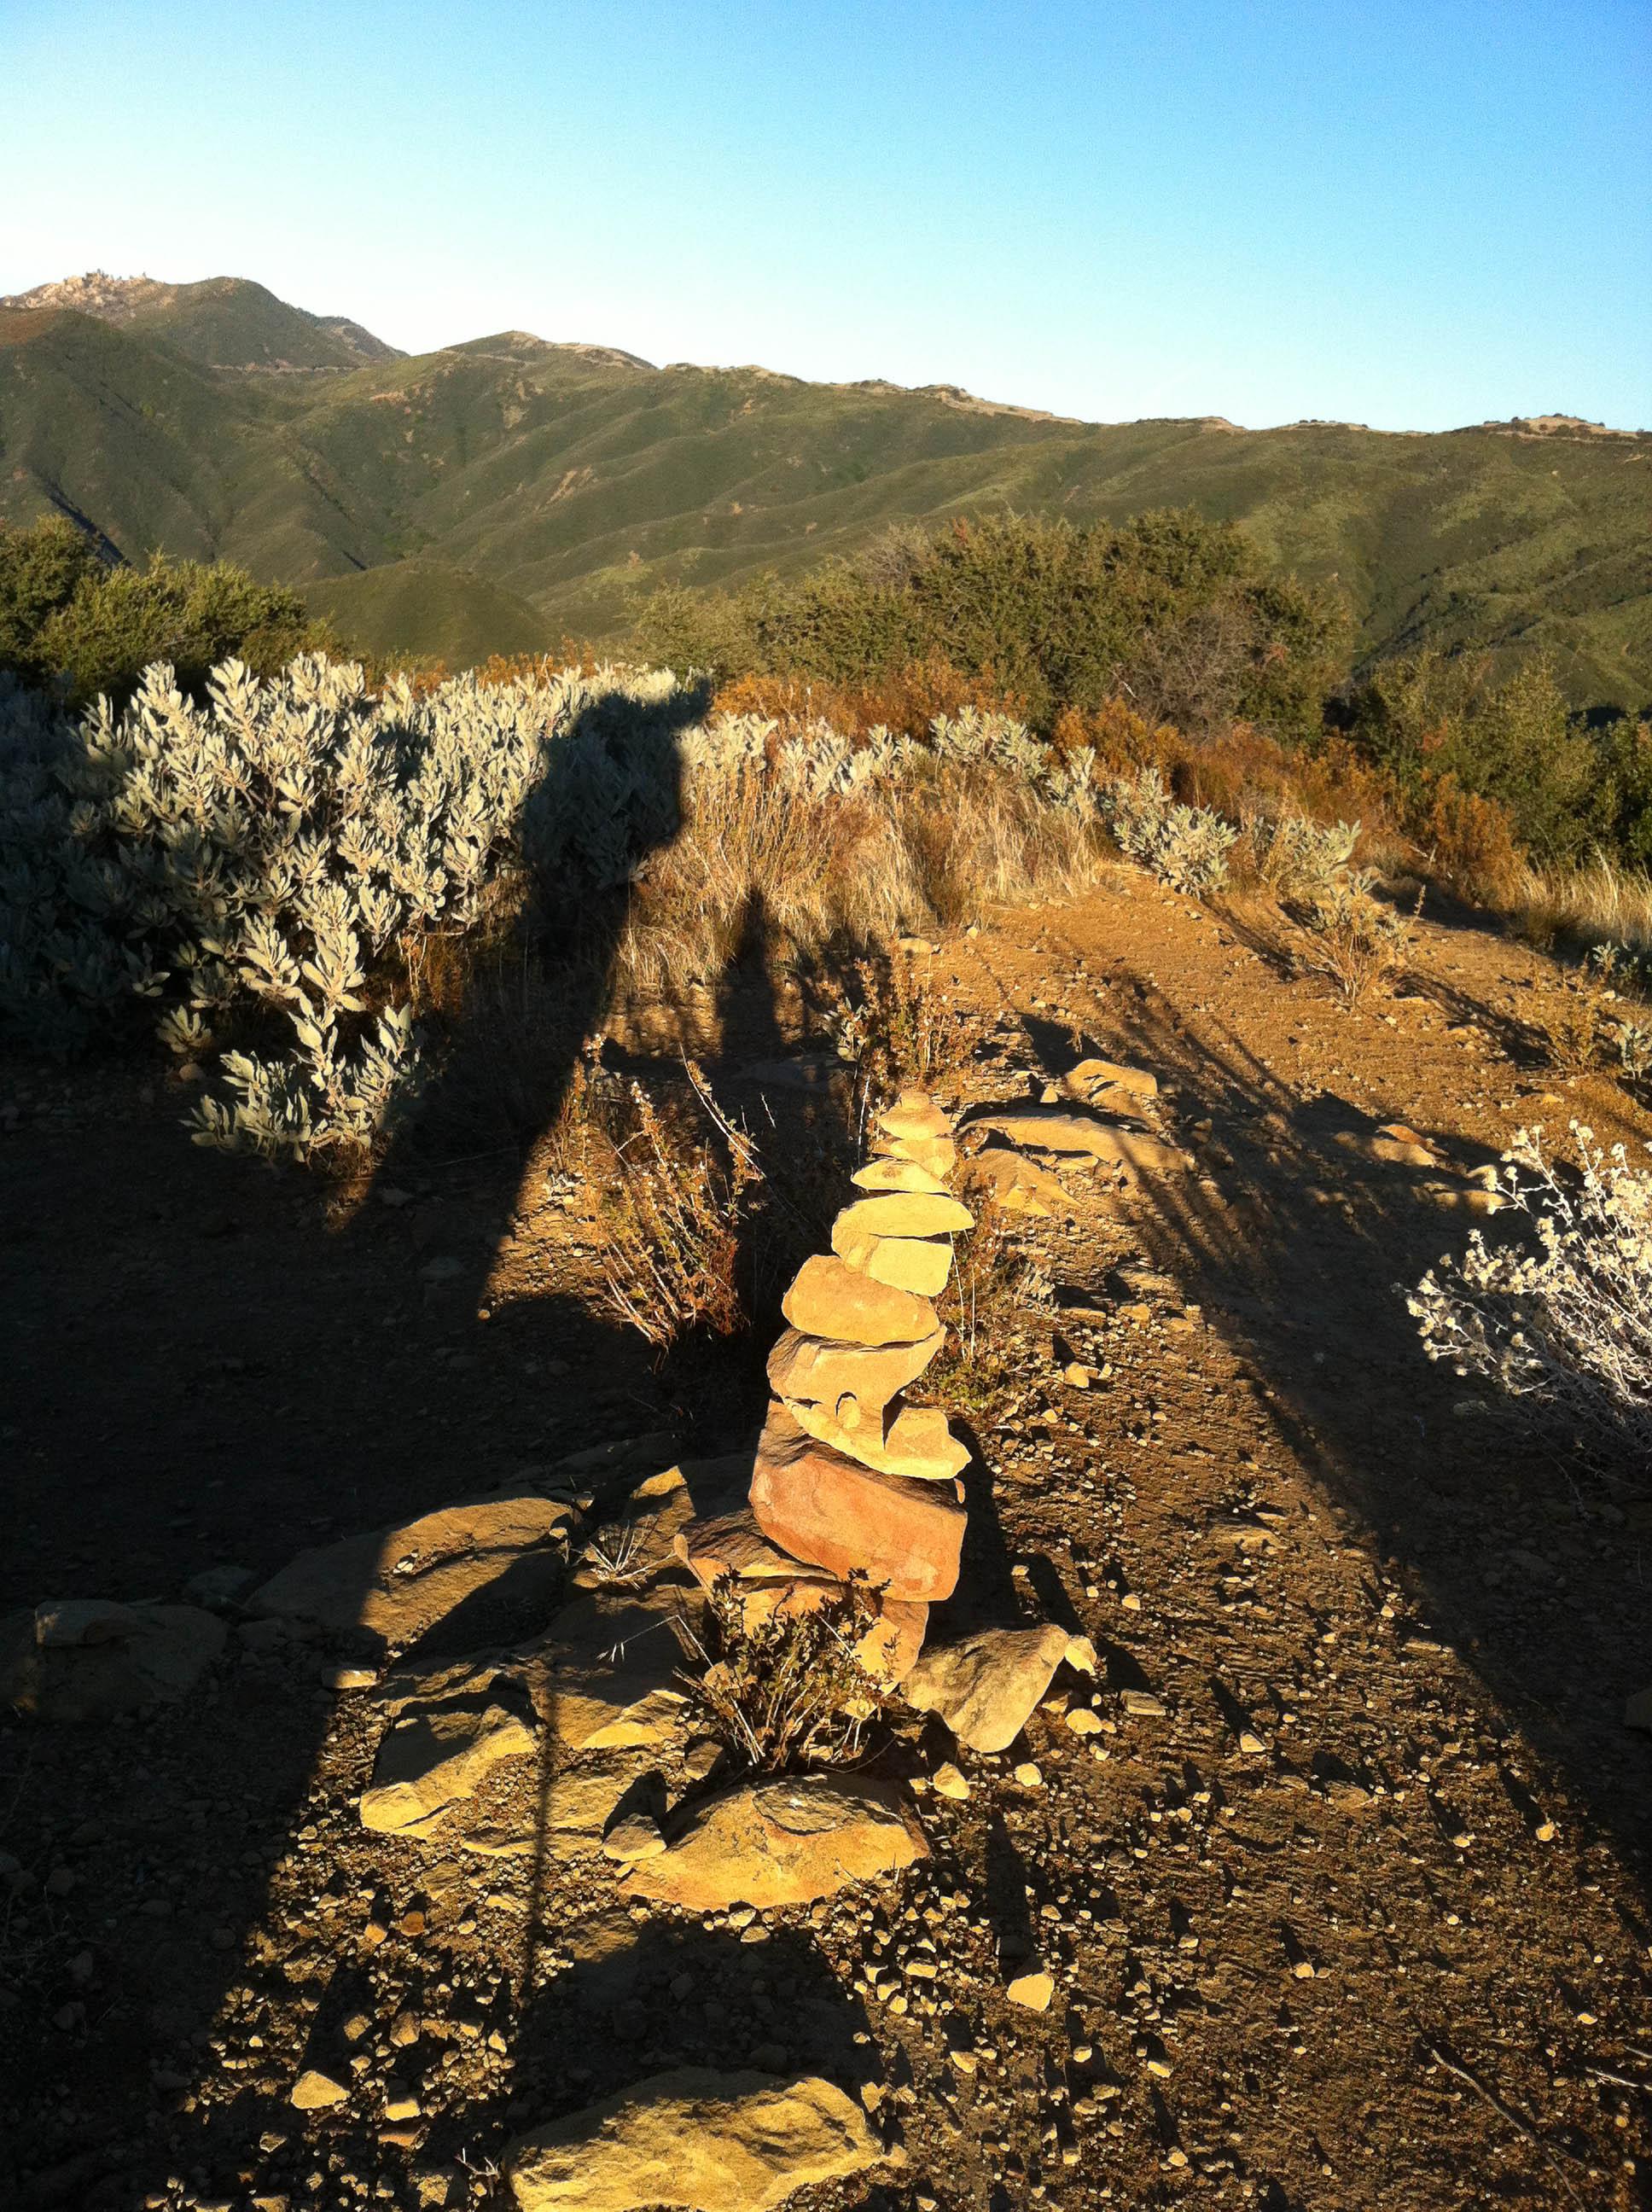 Cairn at the top of Montecito Peak